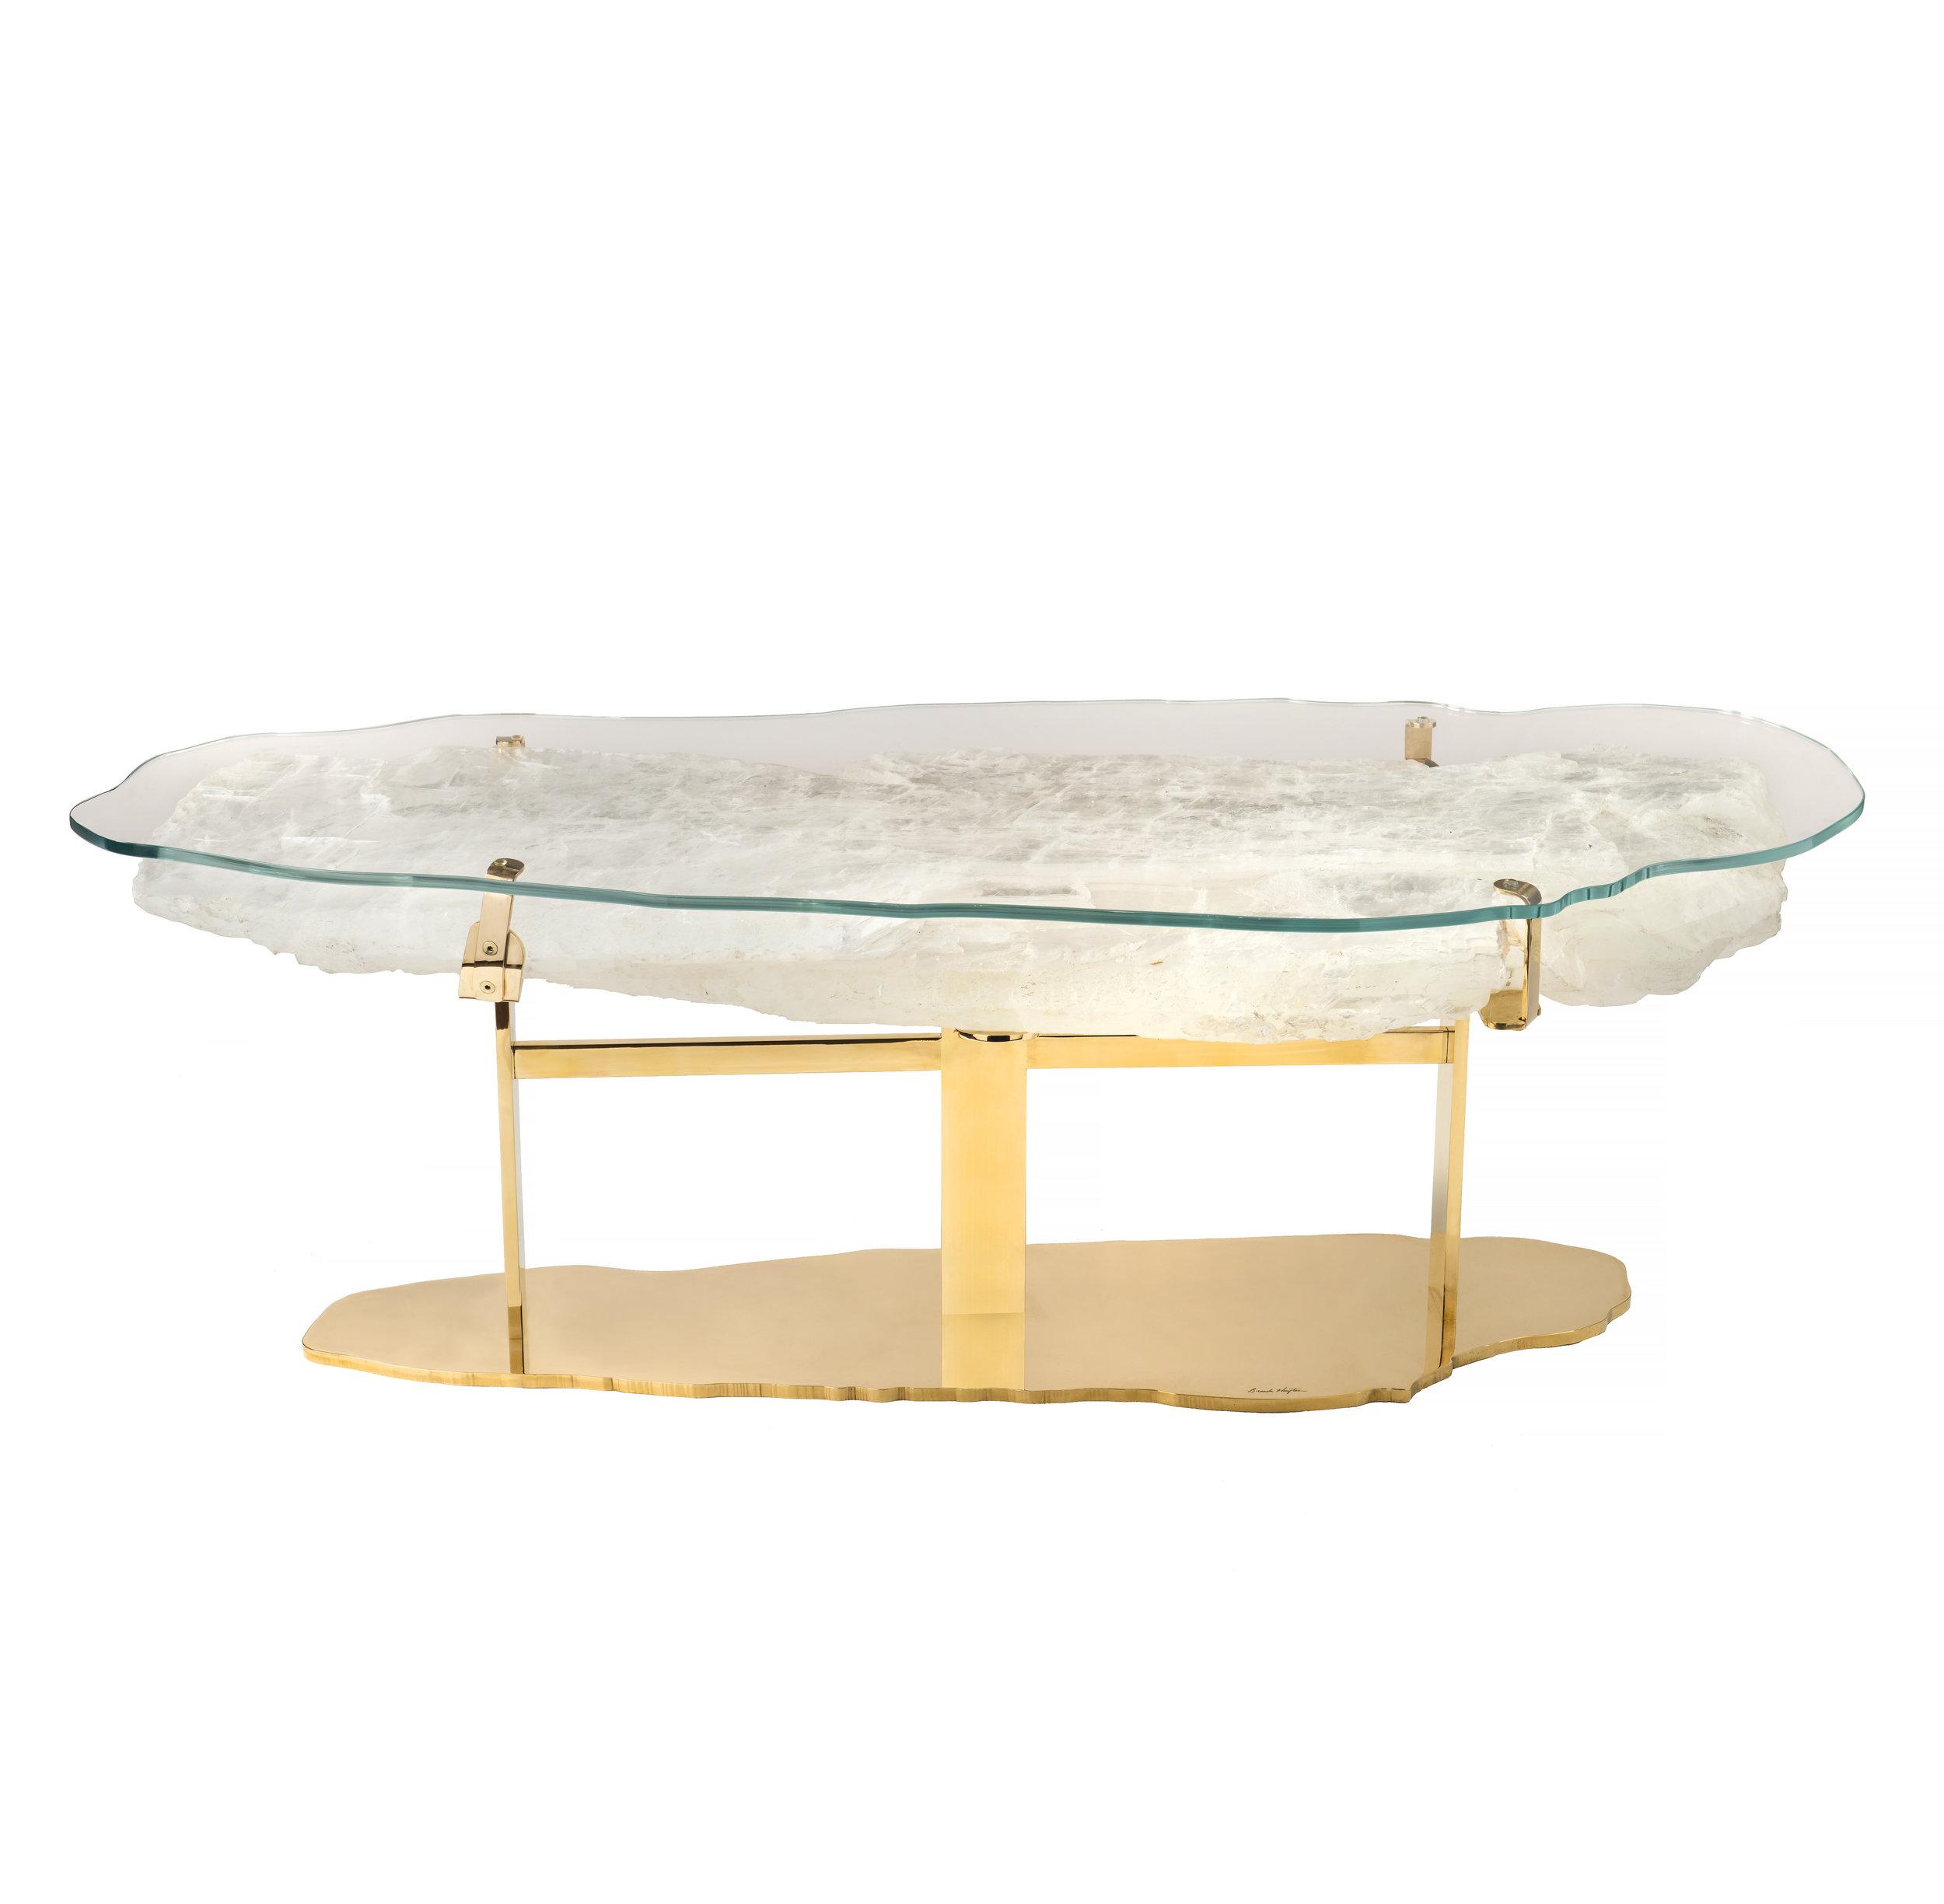 Selenite table jpeg.jpg